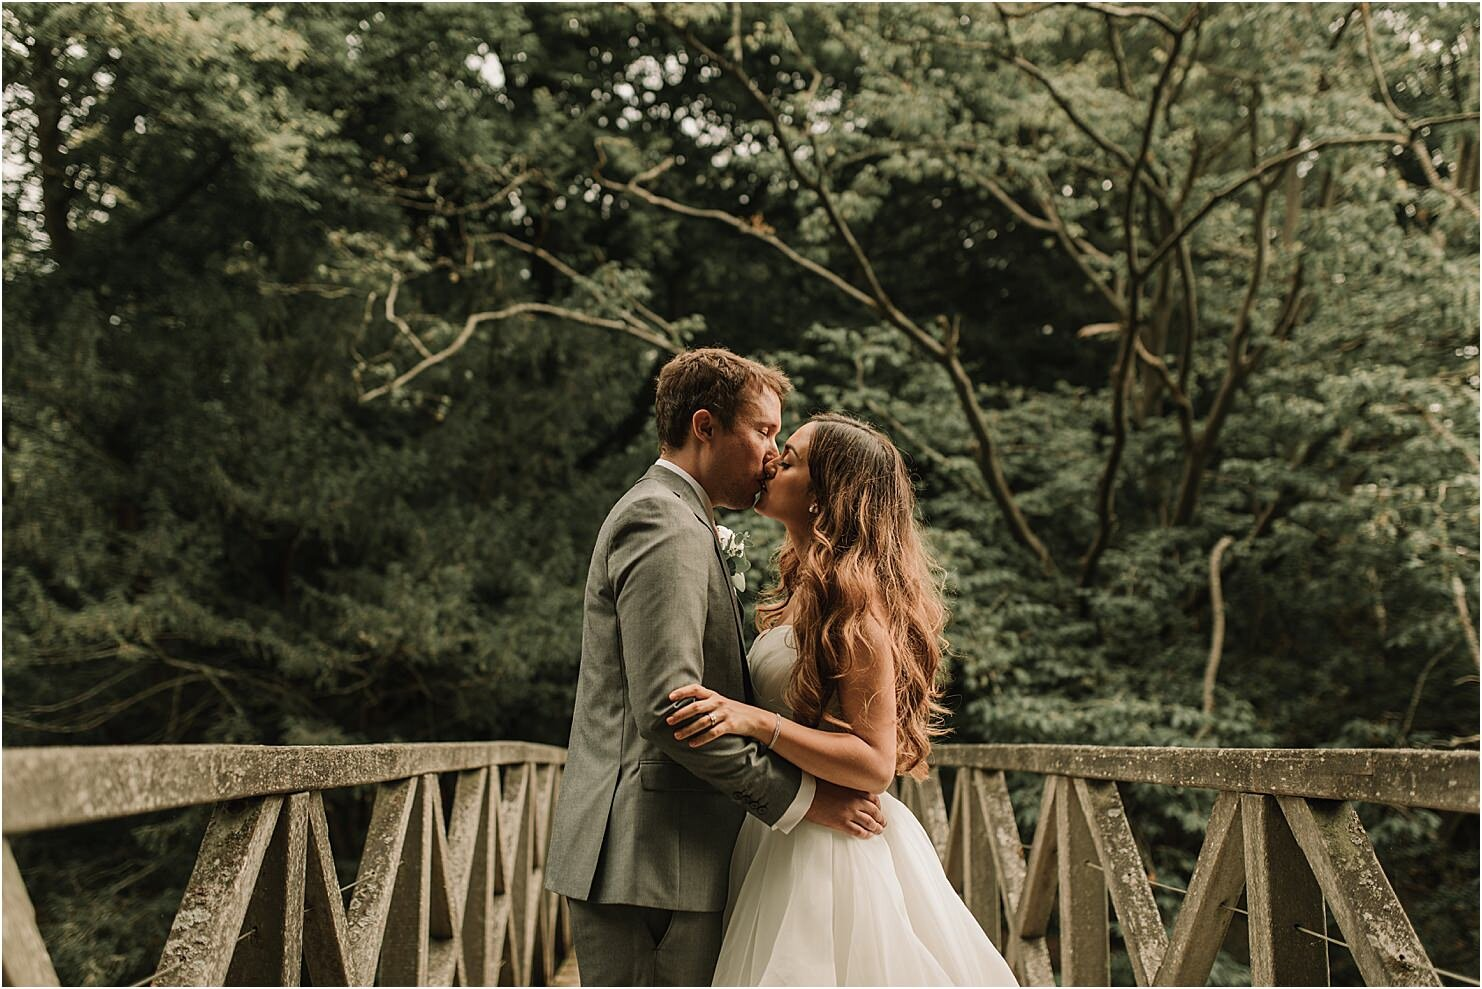 boda-de-cuento-en-castillo-boda-en-londres-72.jpg